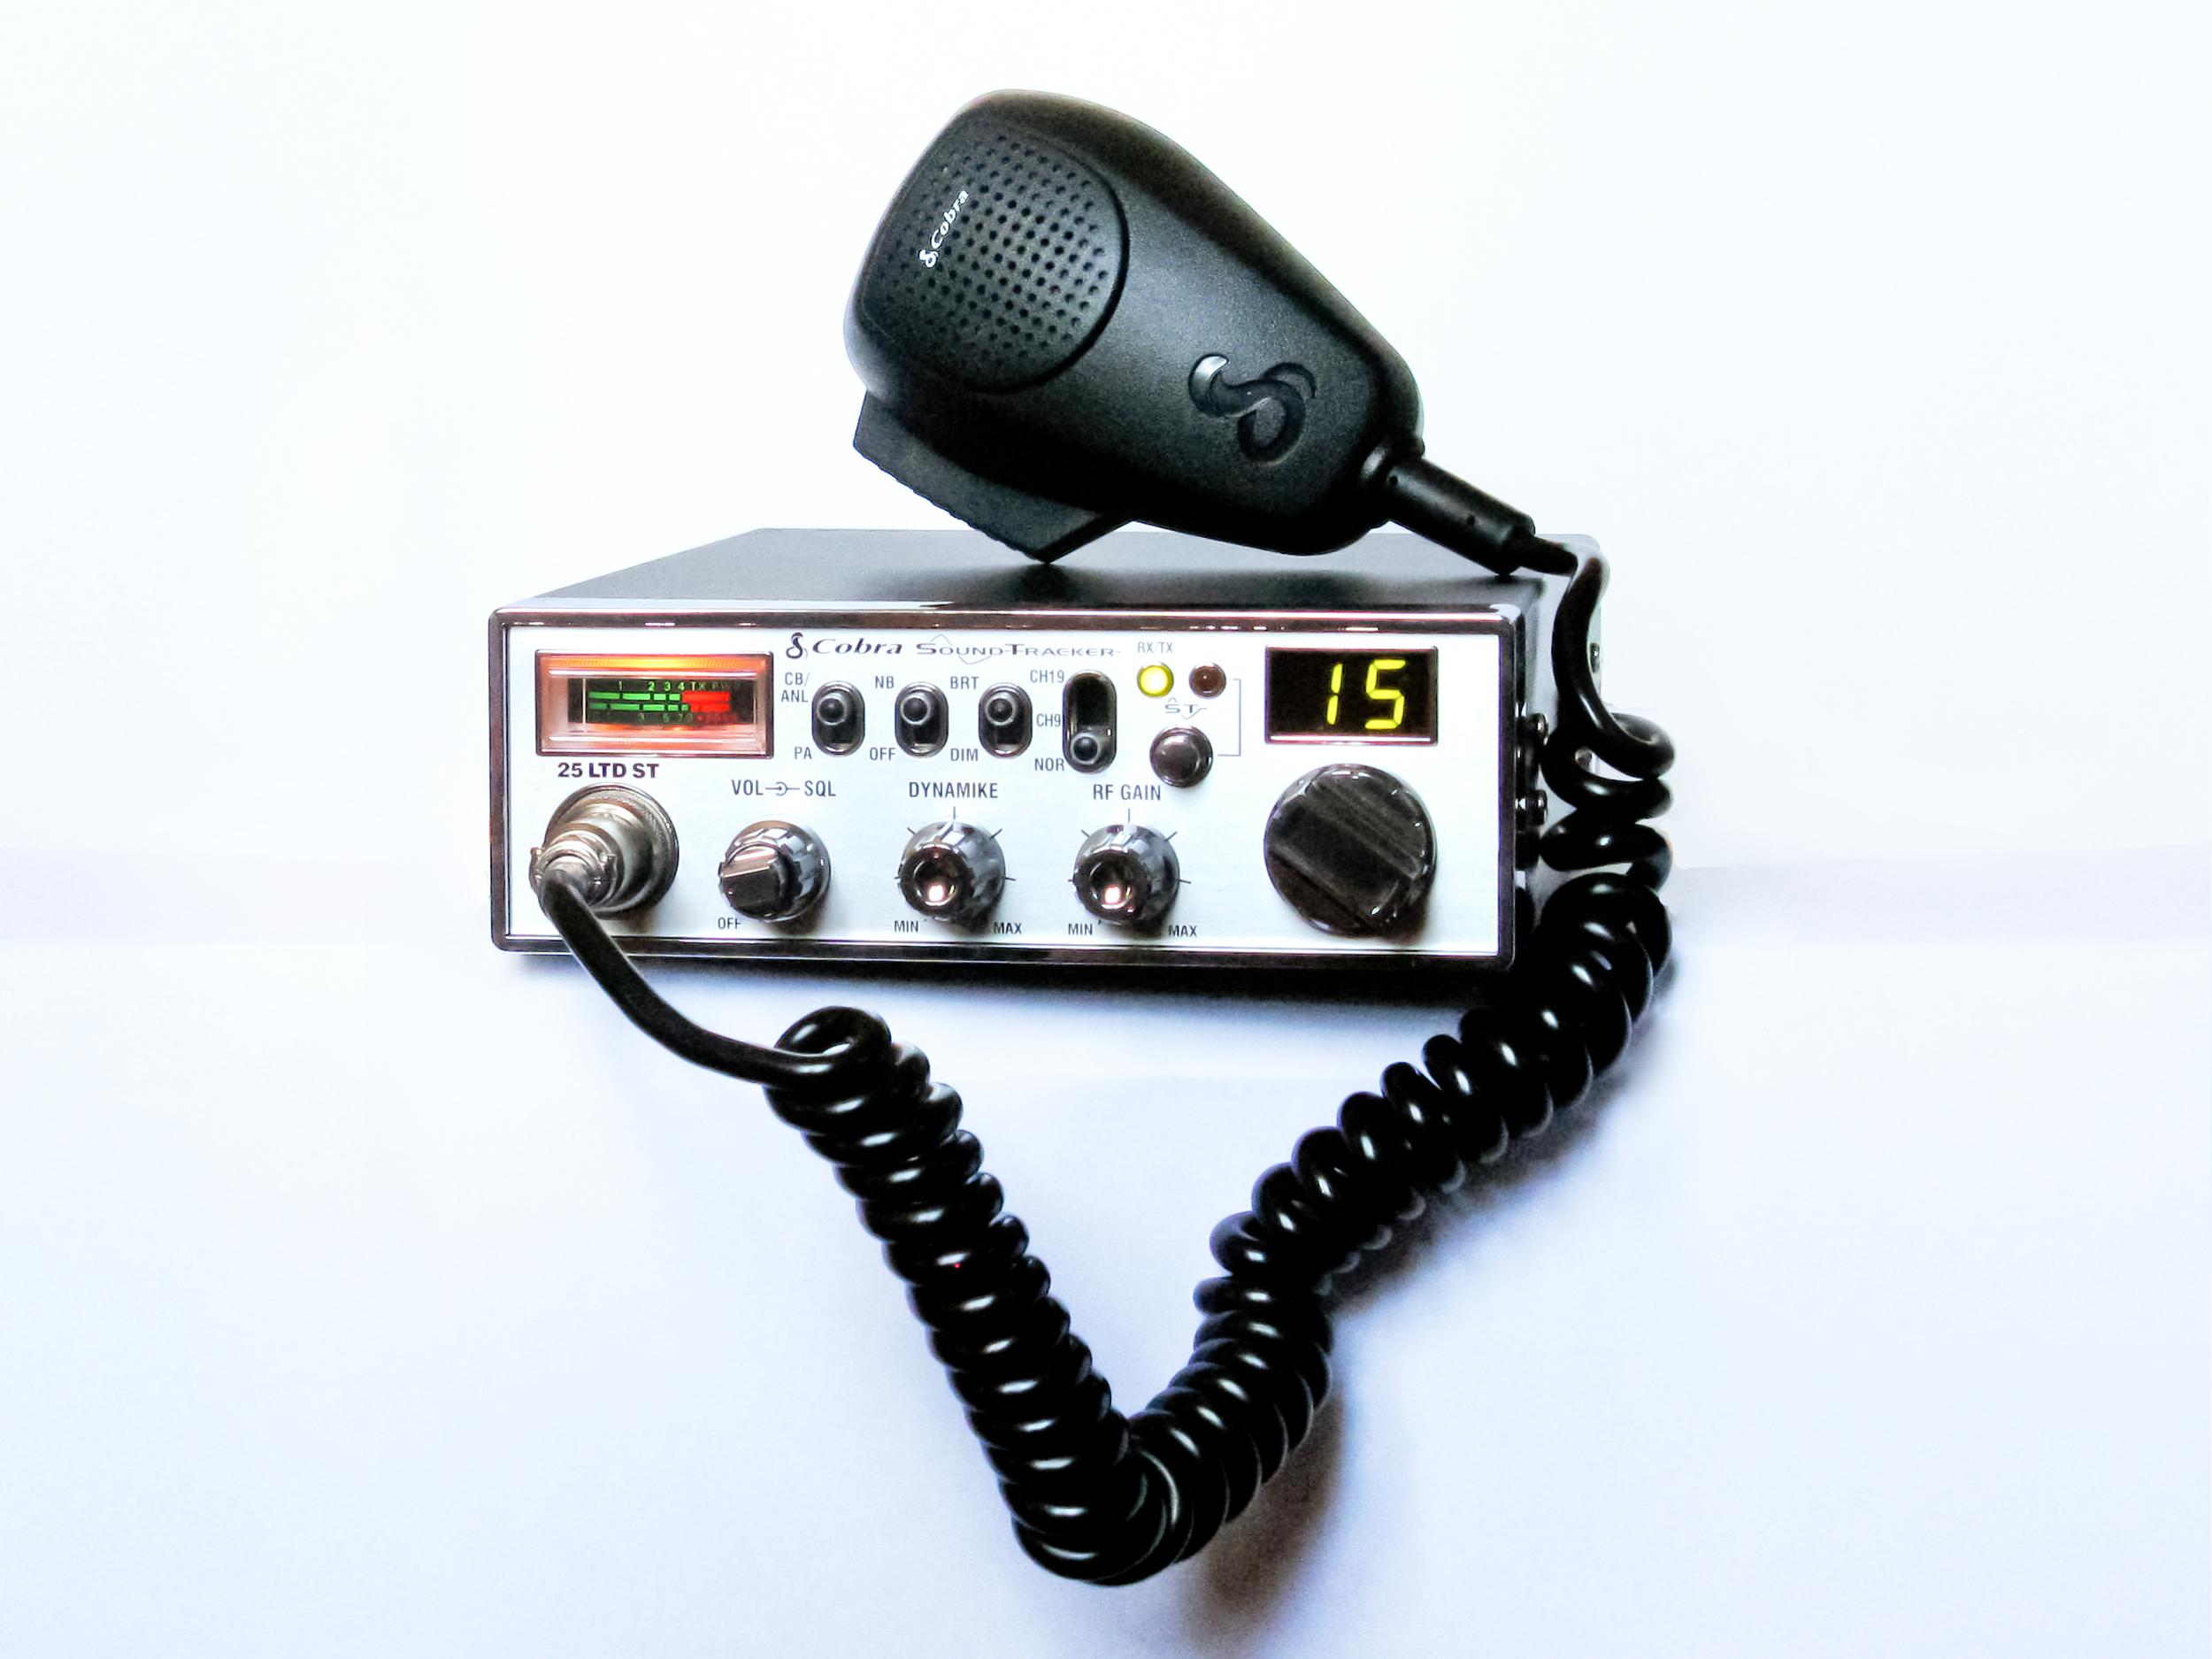 Радиостанции, антенны продажа, установка, сервис